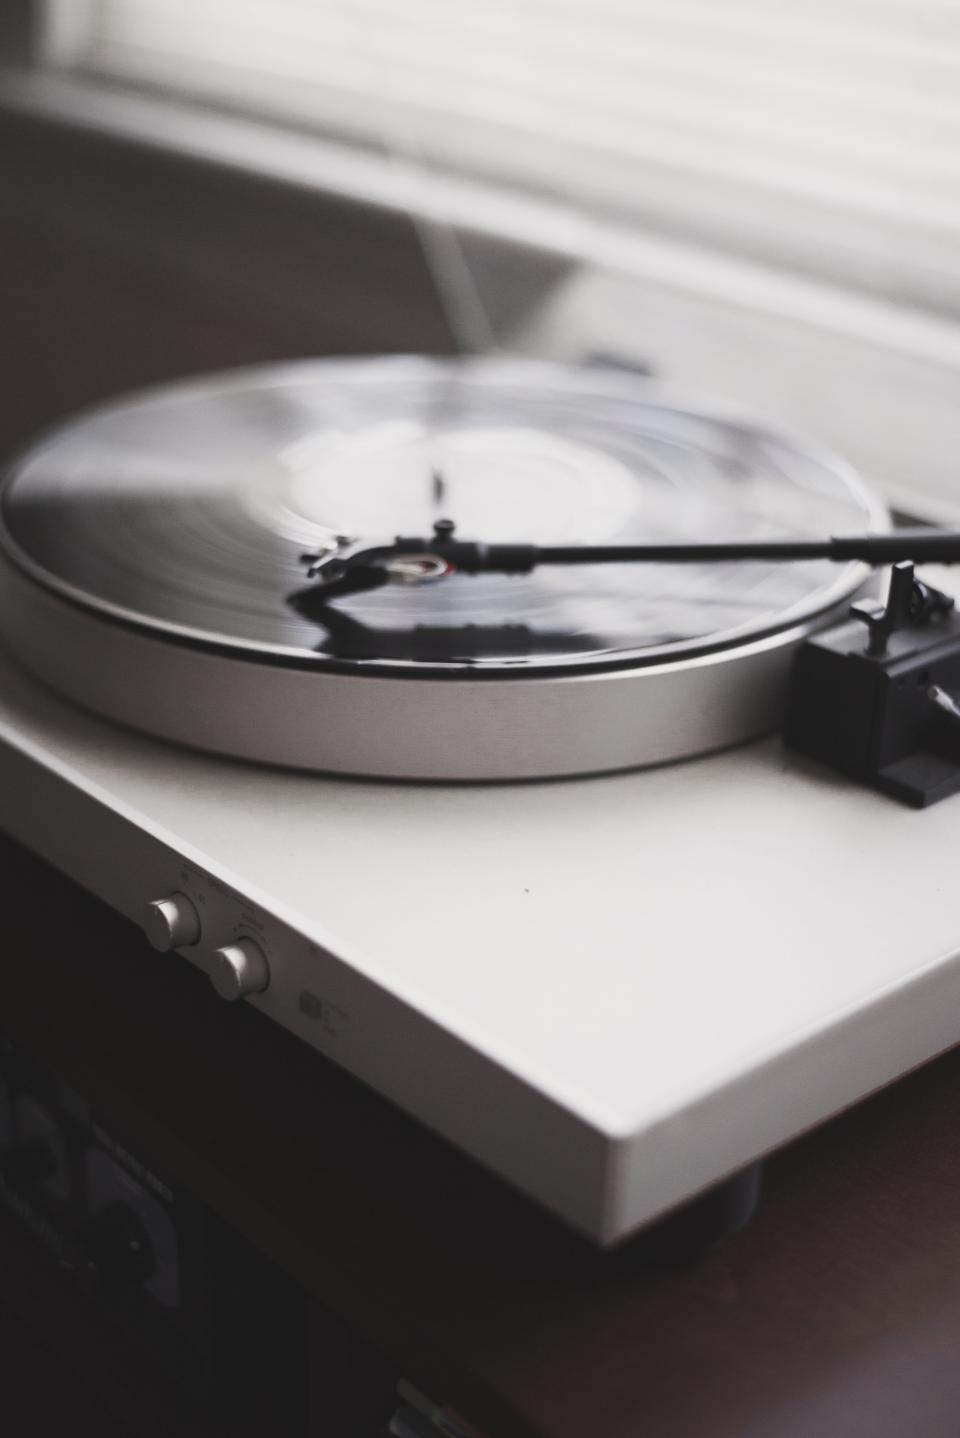 Free Fall Wallpaper Downloads Free Photo Of Vinyl Music Sound Stocksnap Io